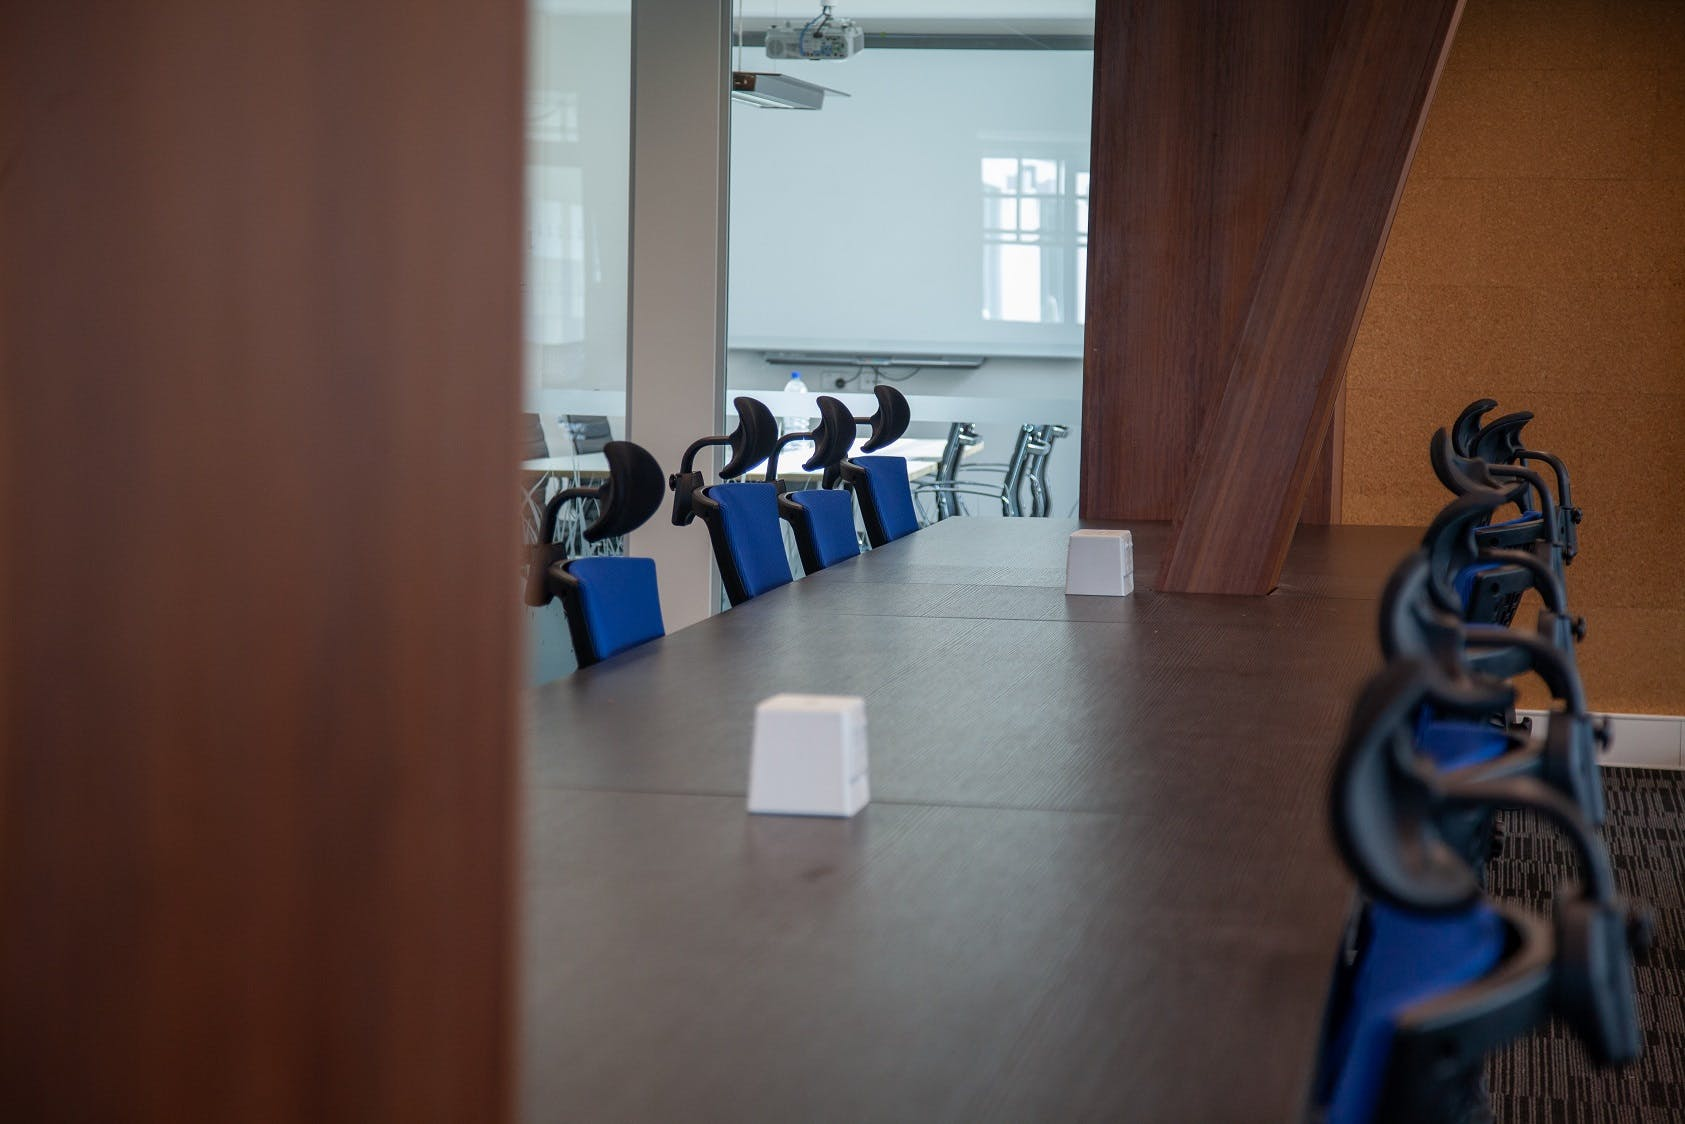 Hot desk at Officenexus, image 1